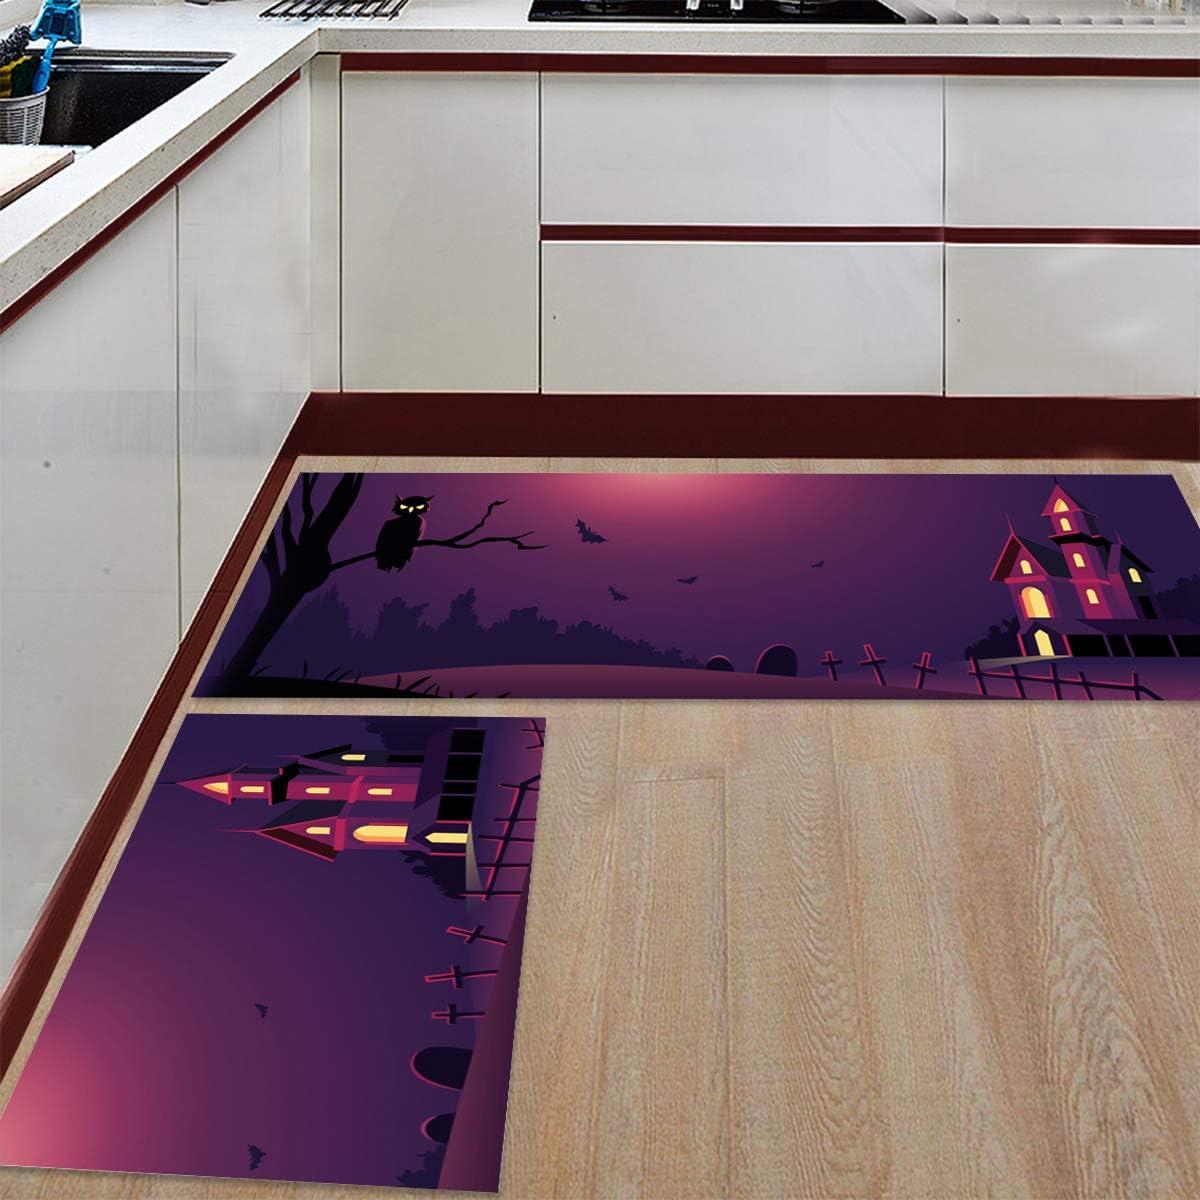 Womenfocus Kitchen Mat Set Manufacturer 4 years warranty regenerated product Anti-WearNon-Slip 2 Floor Pi Rug